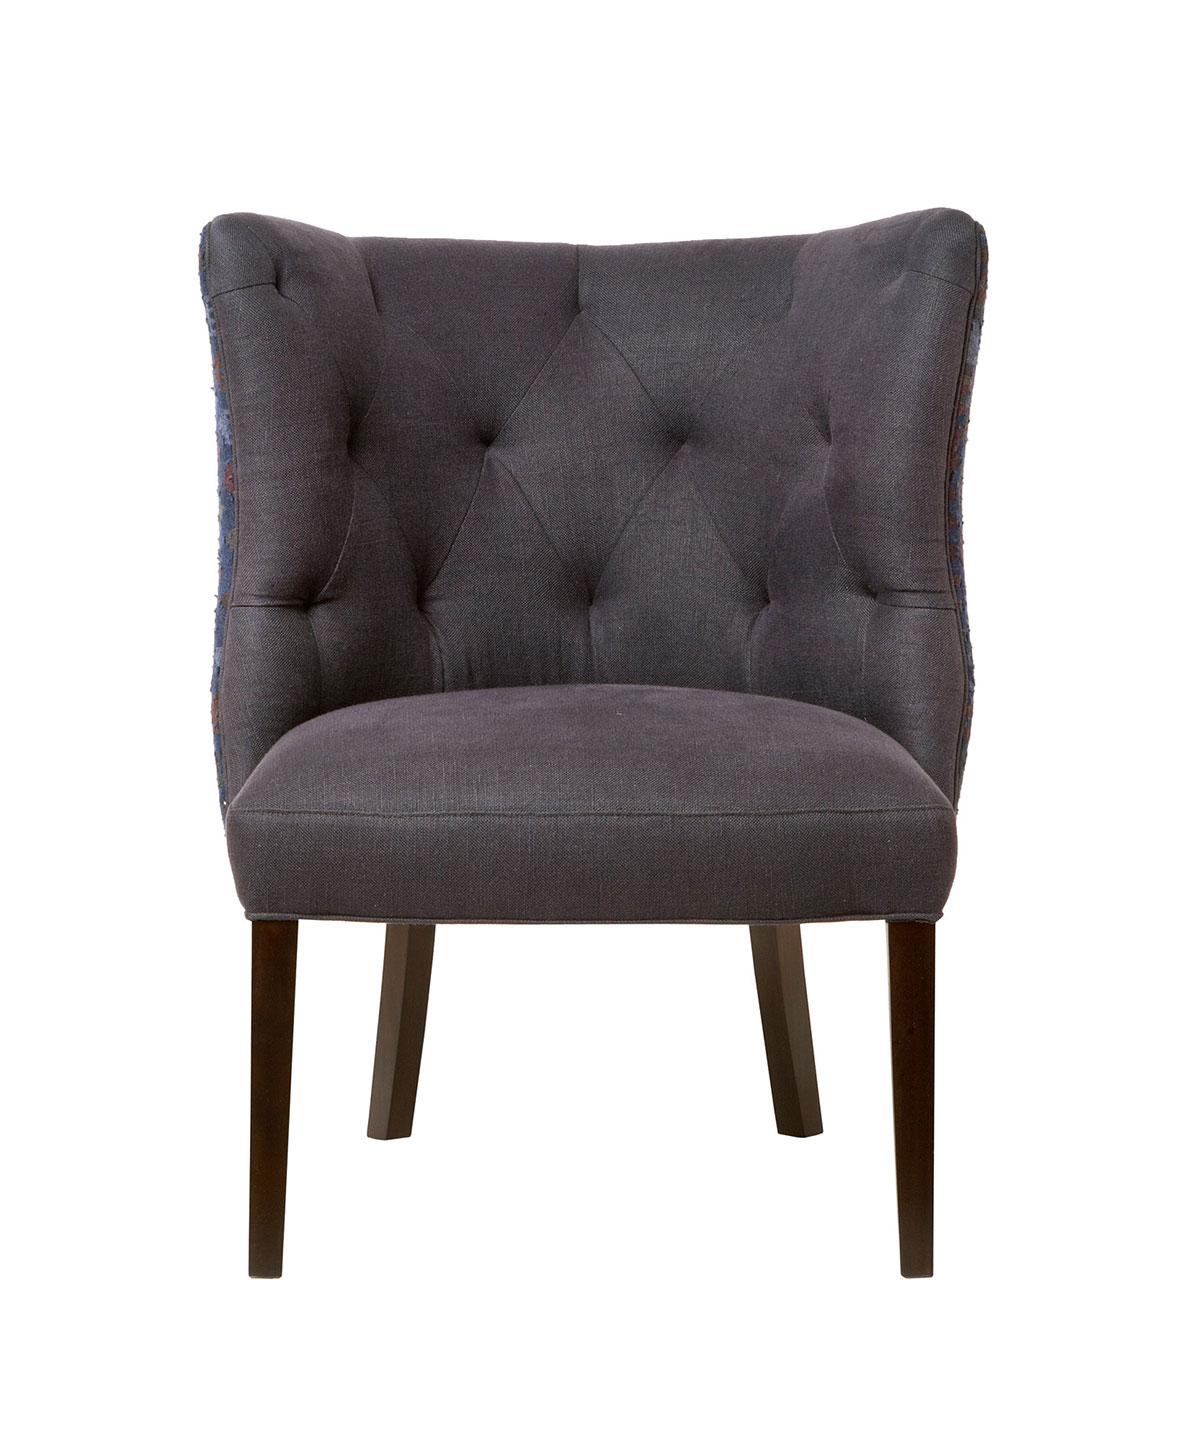 Goodman Chair